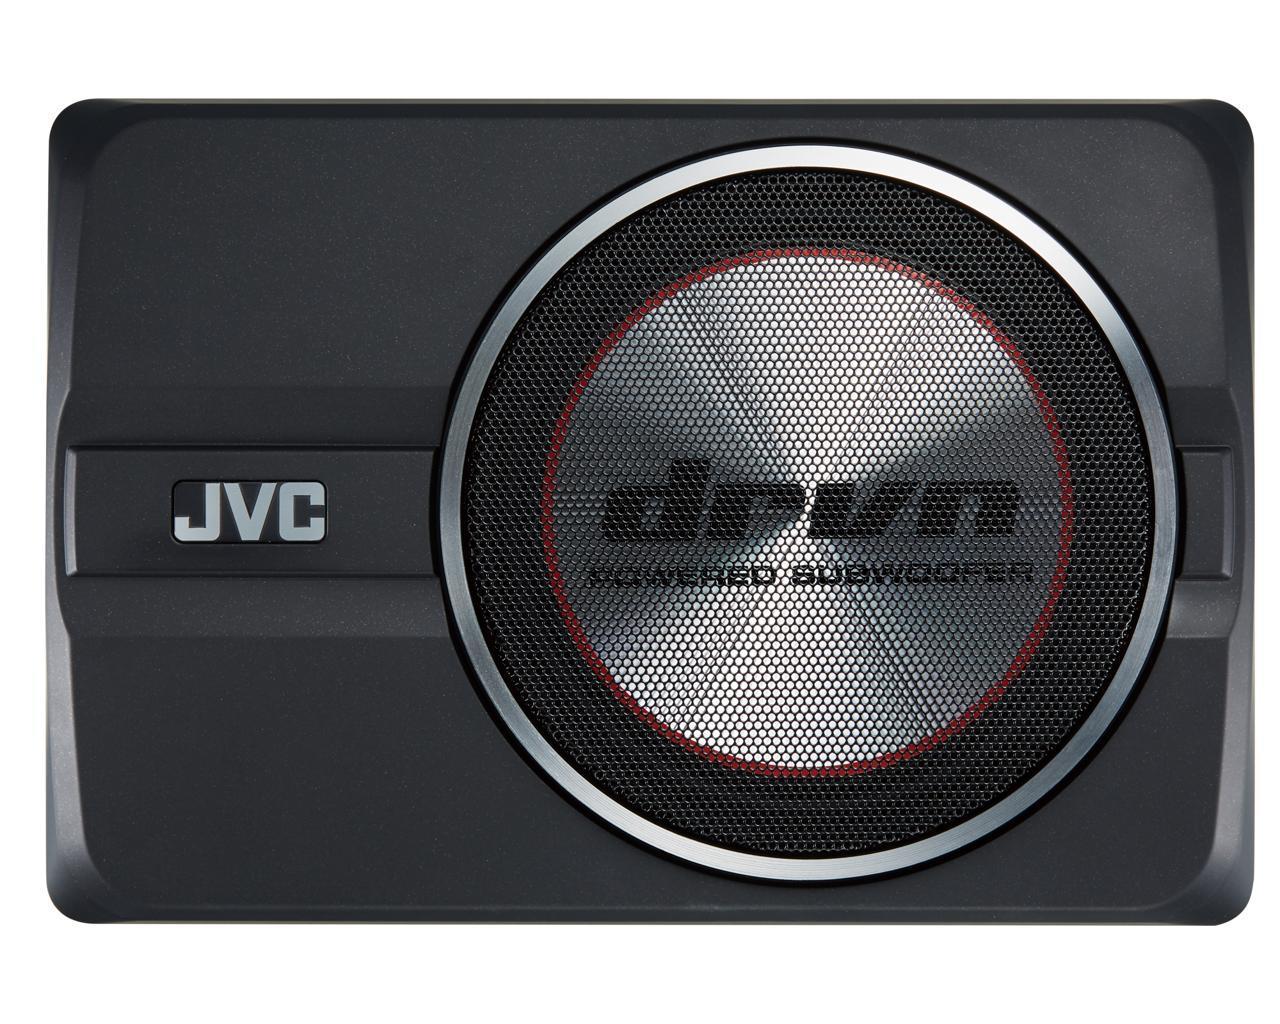 Article № CW-DRA8 JVC prices